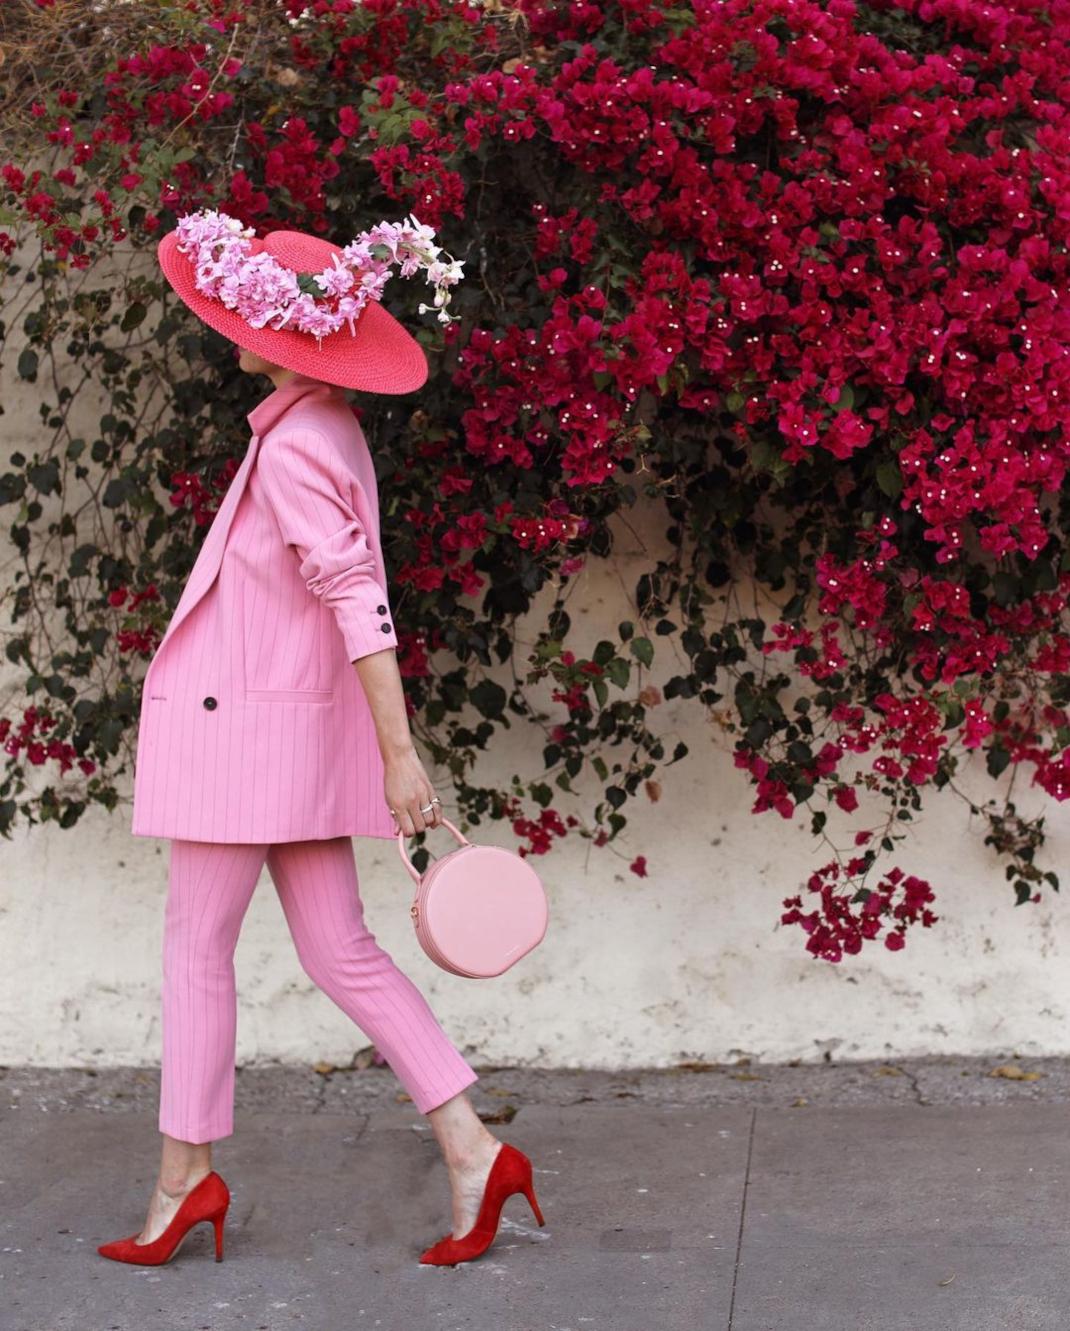 blaireadiebee ροζ κοστούμι ψάθινο καπέλο